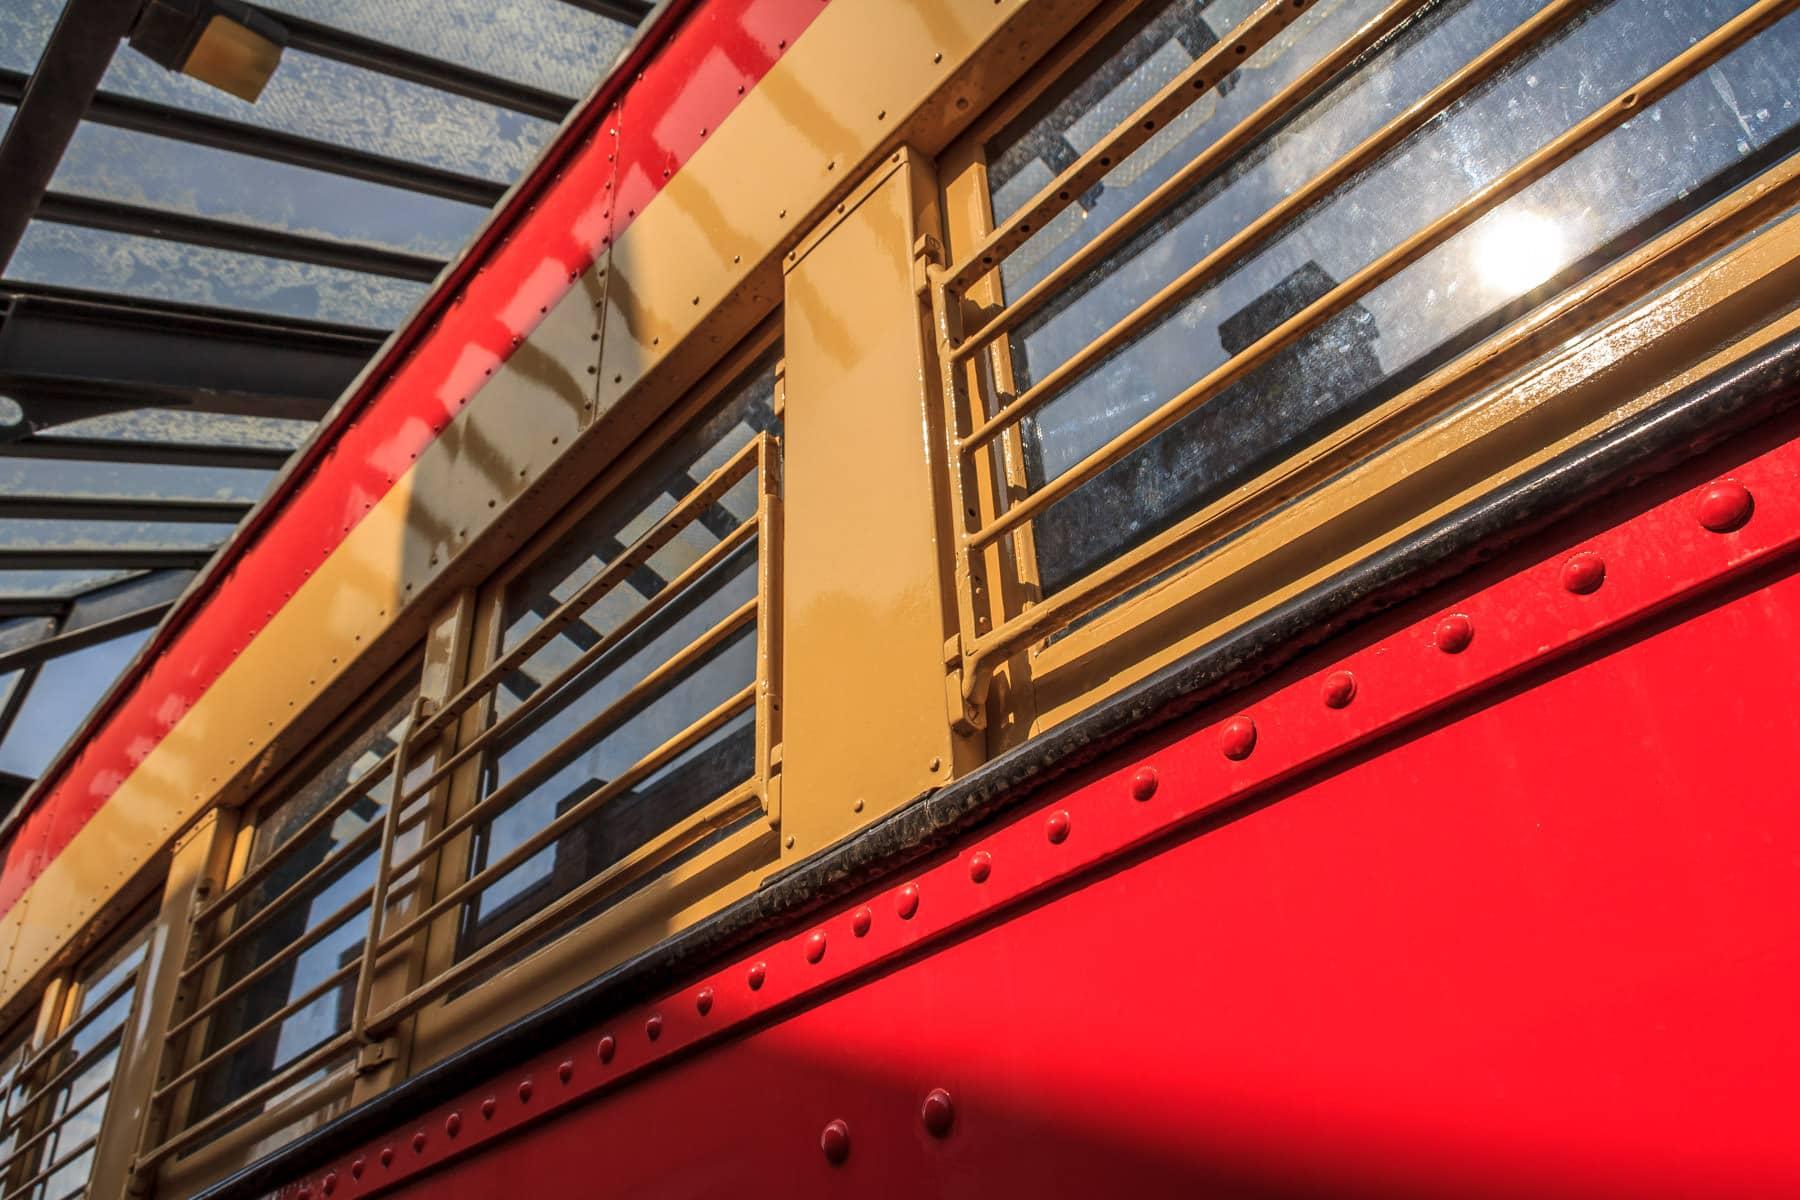 Detail of a Texas Electric Railway interurban mail car at the Interurban Railway Museum, Plano, Texas.